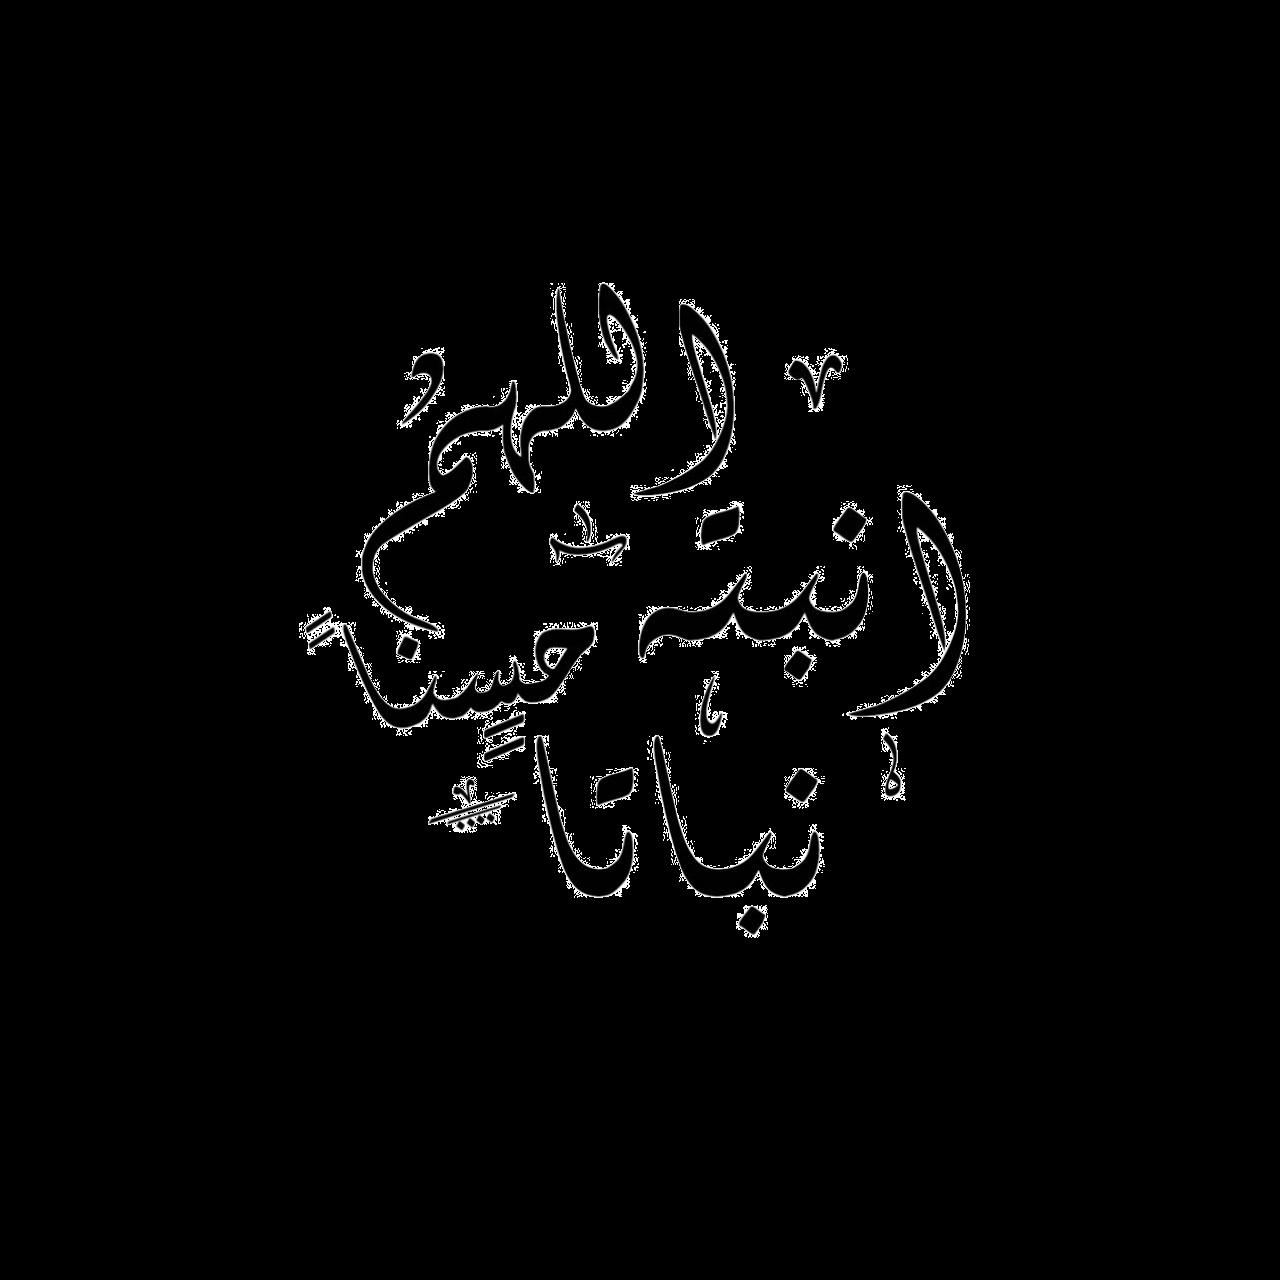 Iphone Sayings Wallpaper نتيجة بحث الصور عن اللهم انبتها نباتا حسنا ابيض واسود